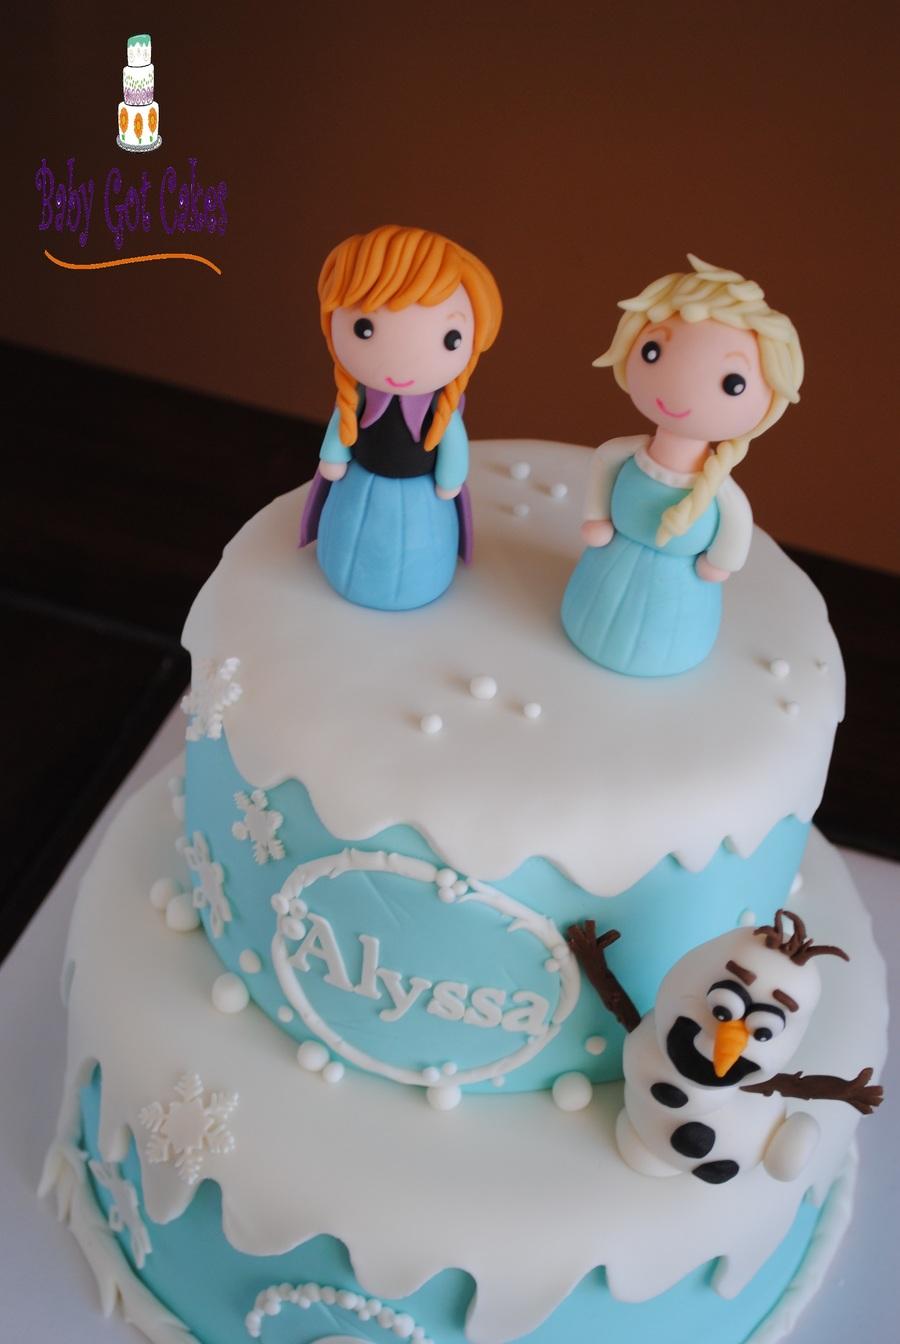 How To Make An Olaf Cake Easy